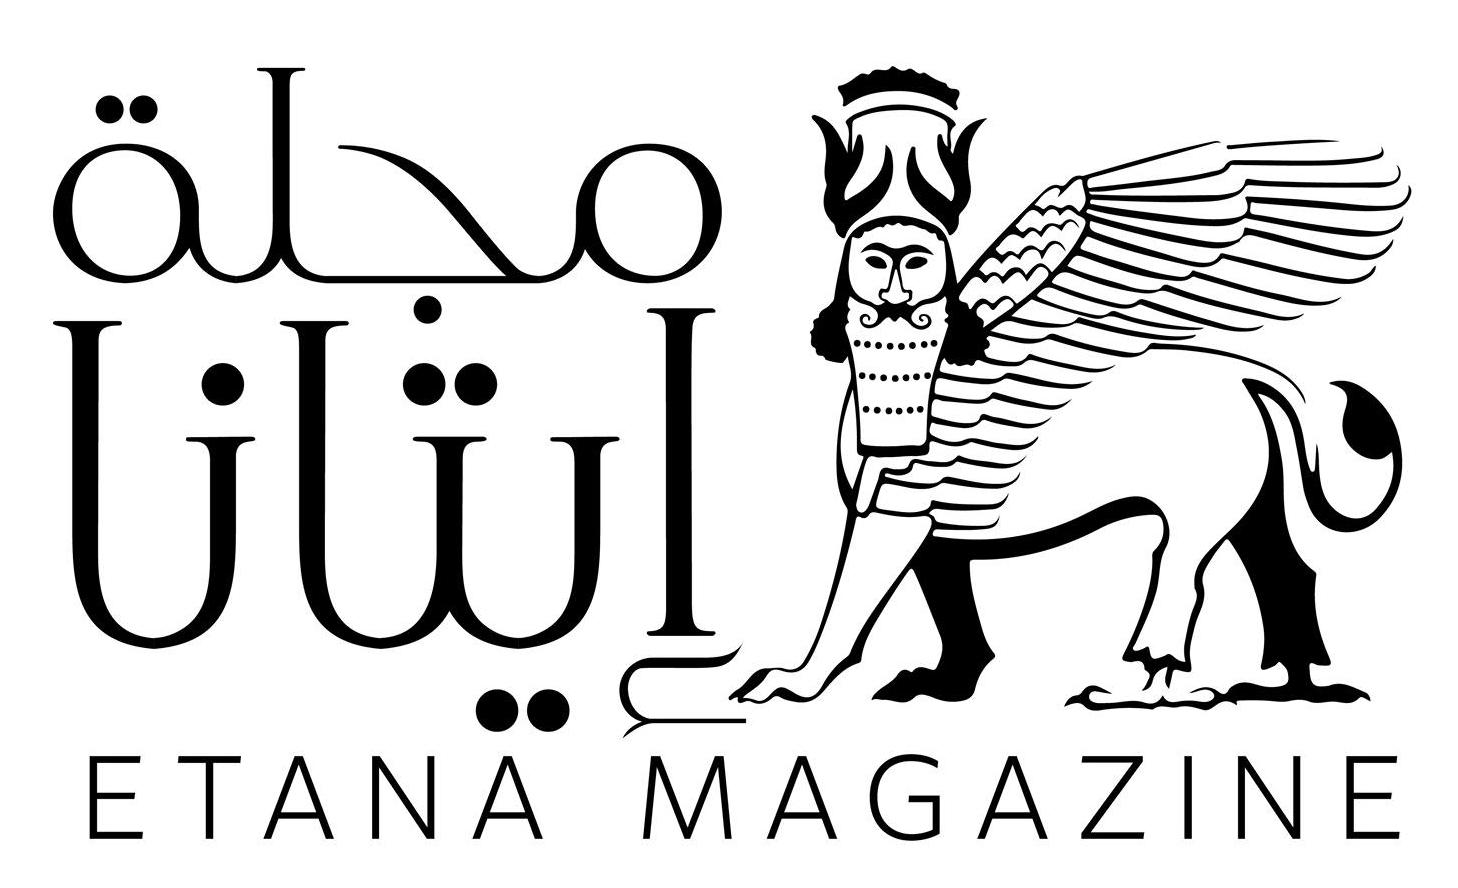 مجلة ايتانا | Etana Magazine